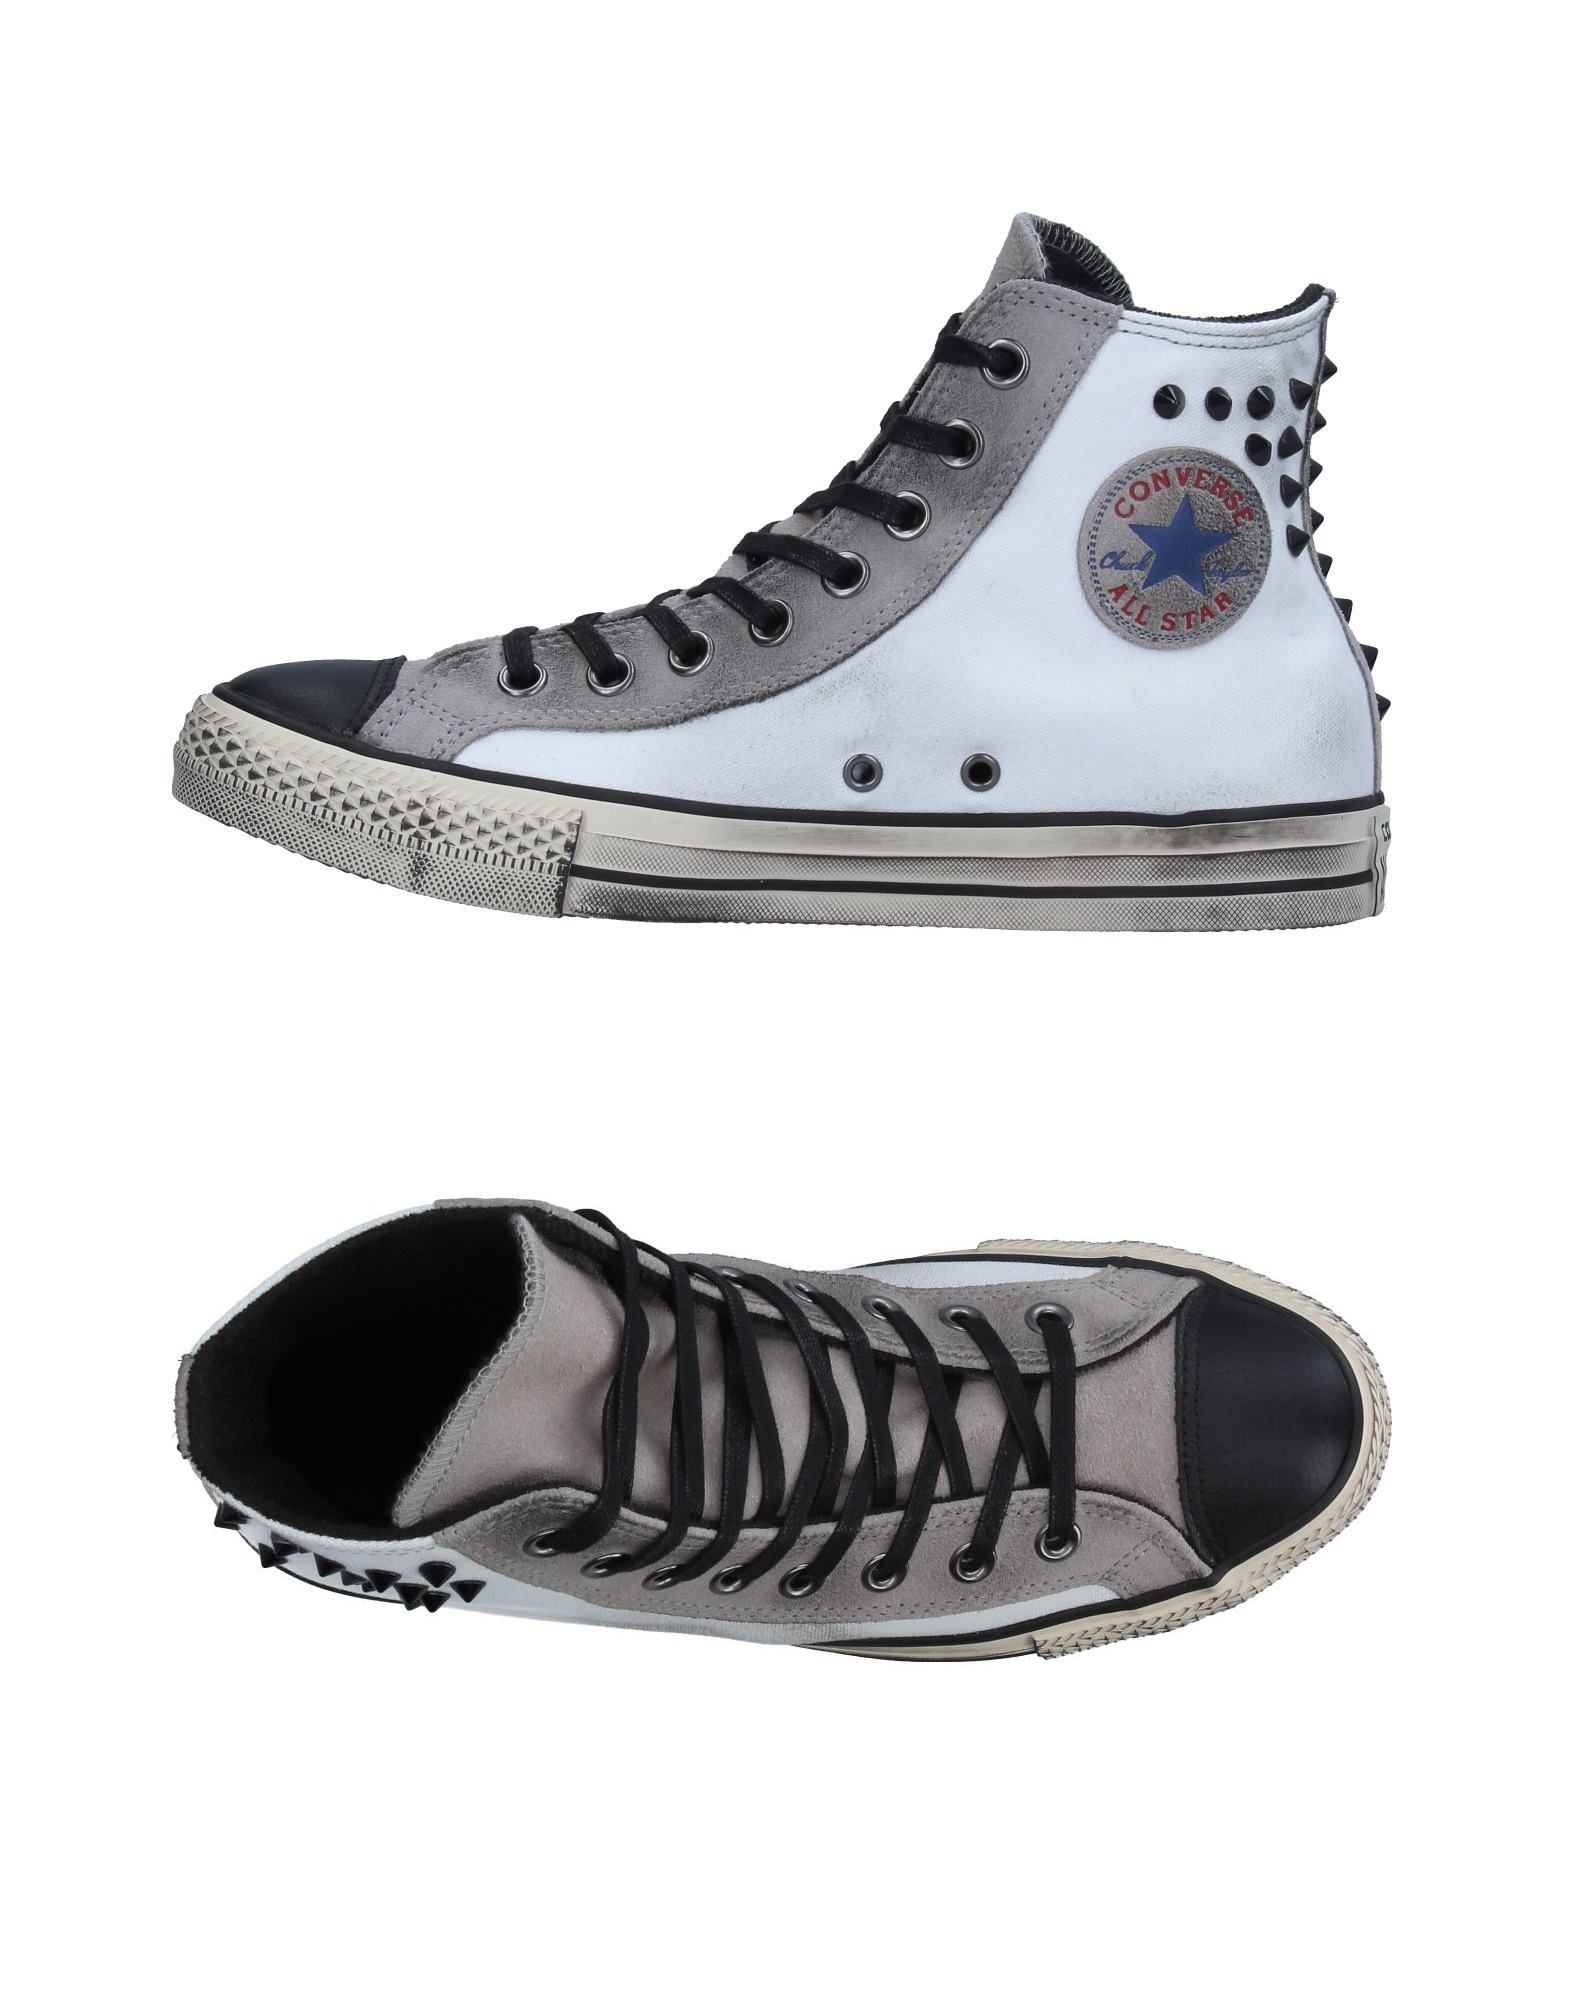 CONVERSE ALL STAR Damen High Sneakers & Tennisschuhe Farbe Grau Größe 8